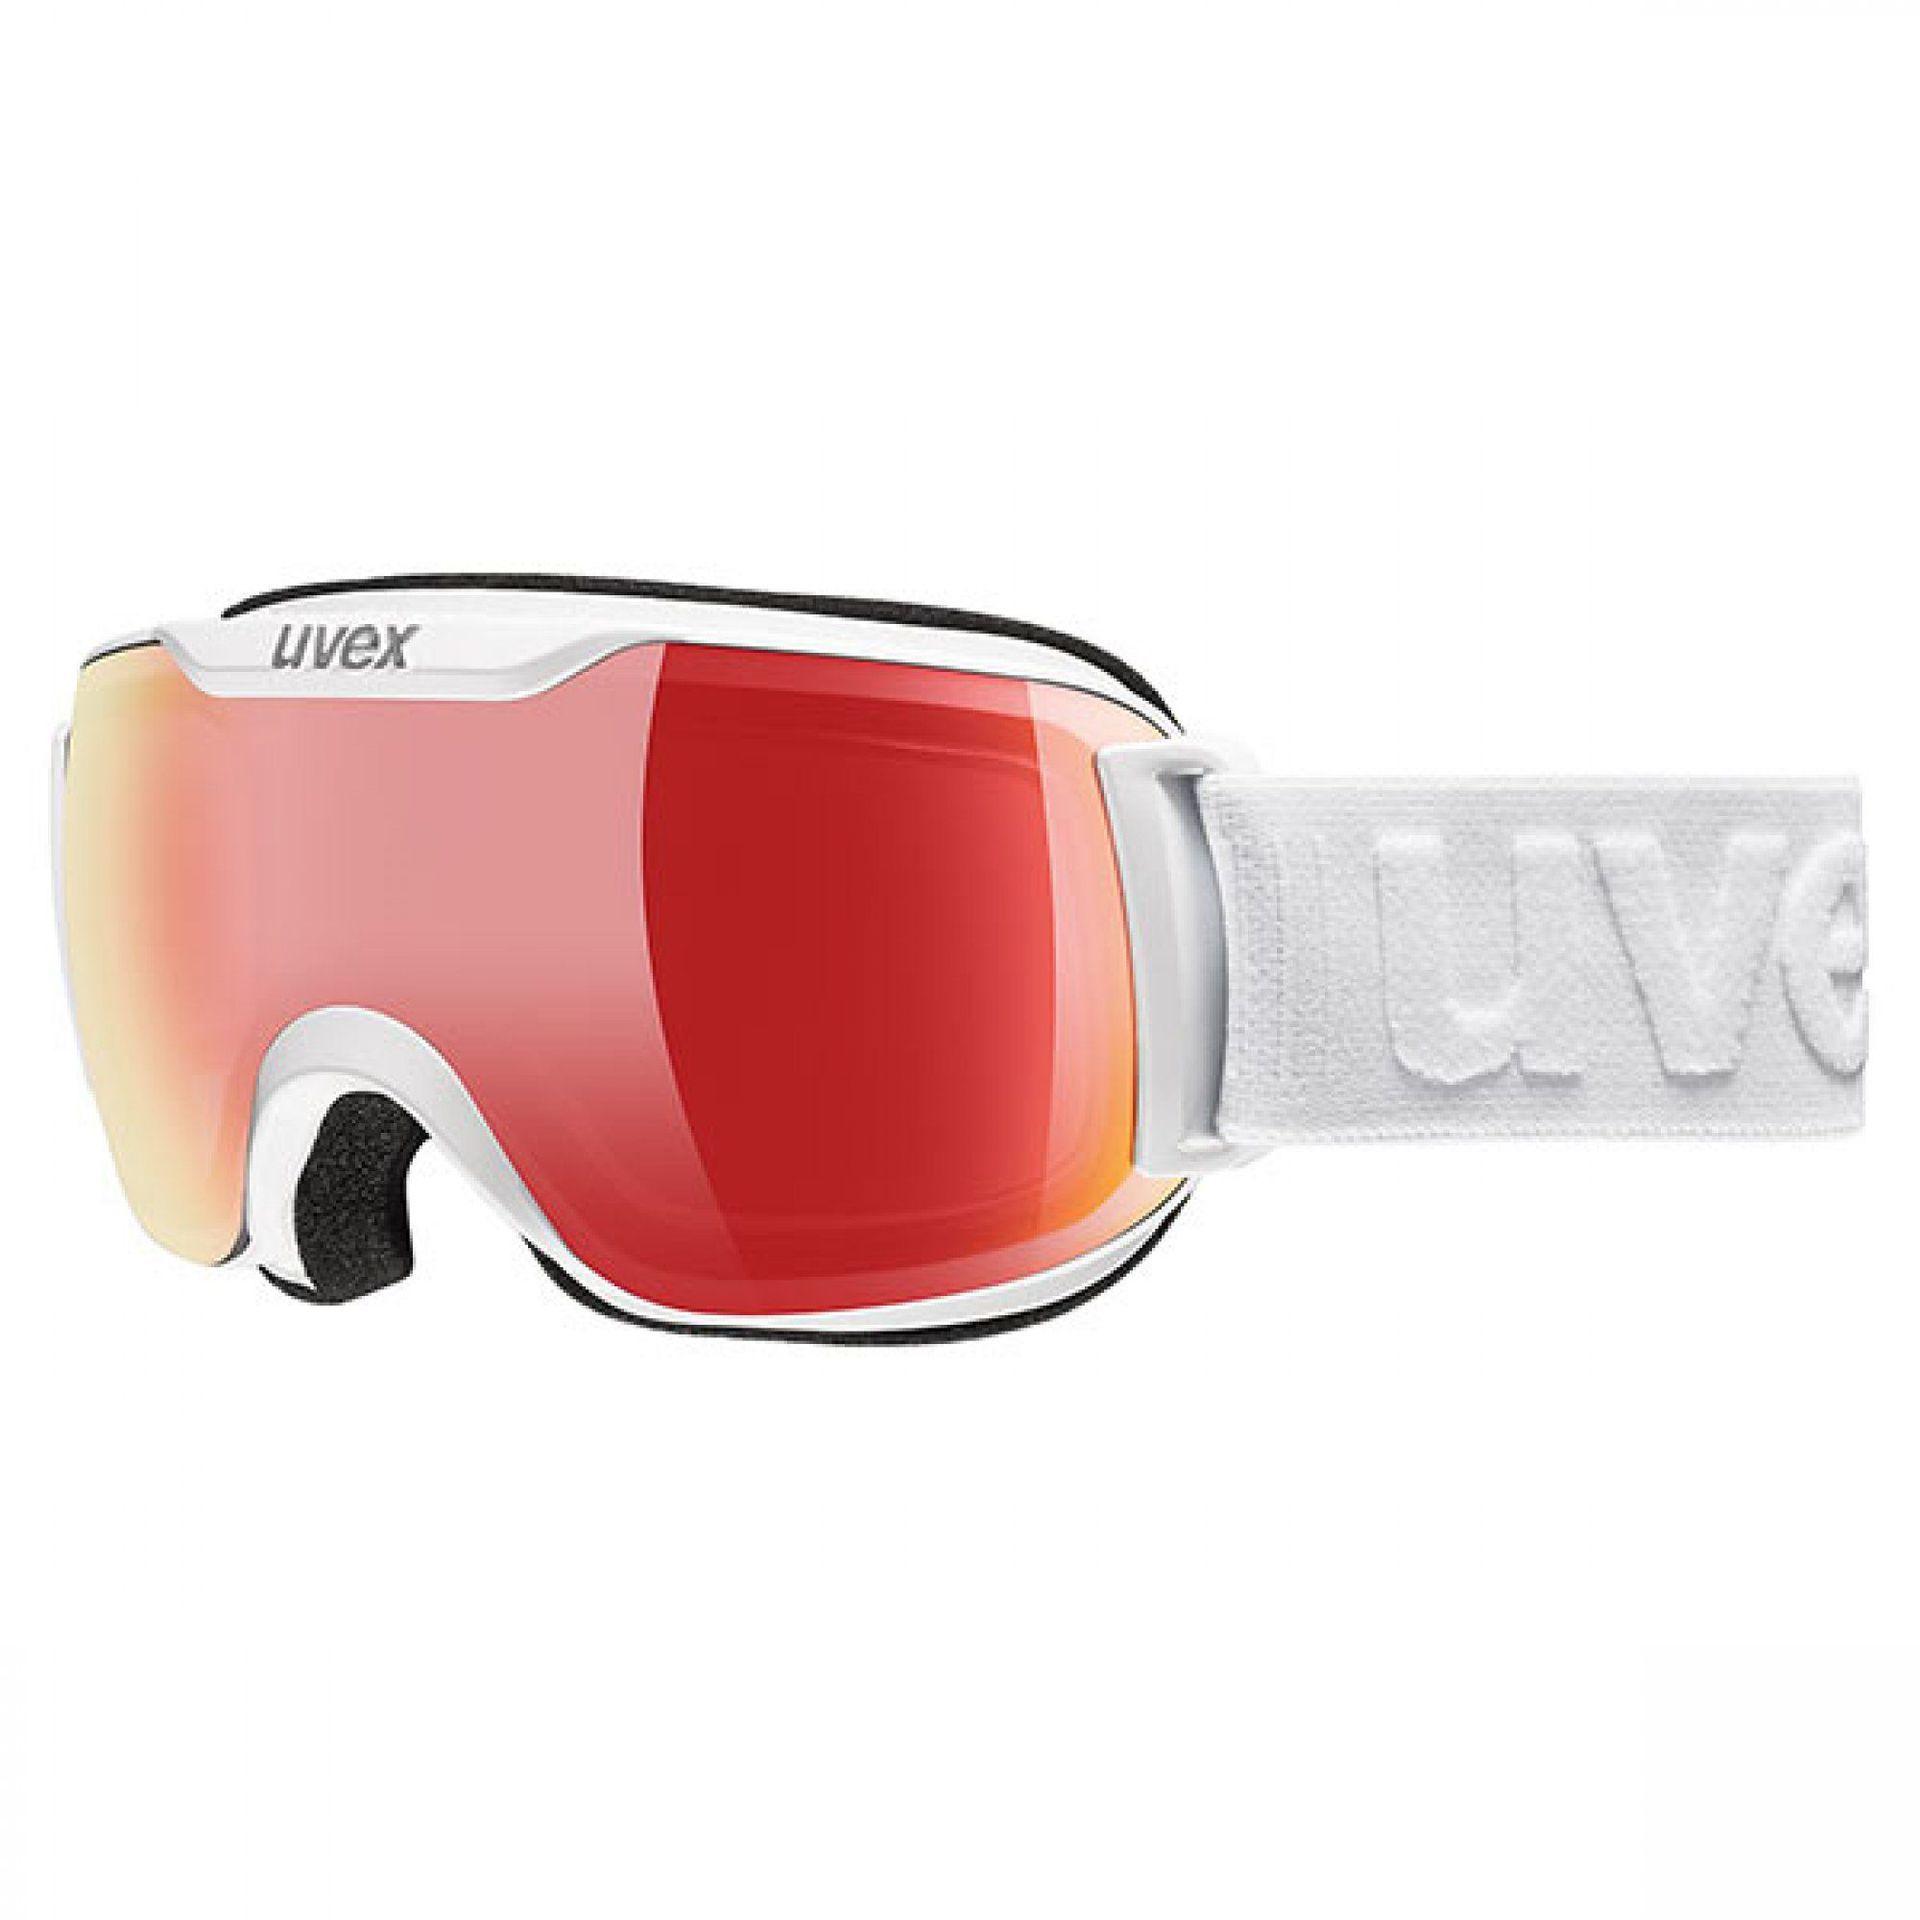 GOGLE UVEX DOWNHILL 2000 S VFM WHITE VARIOMATIC RED MIRROR